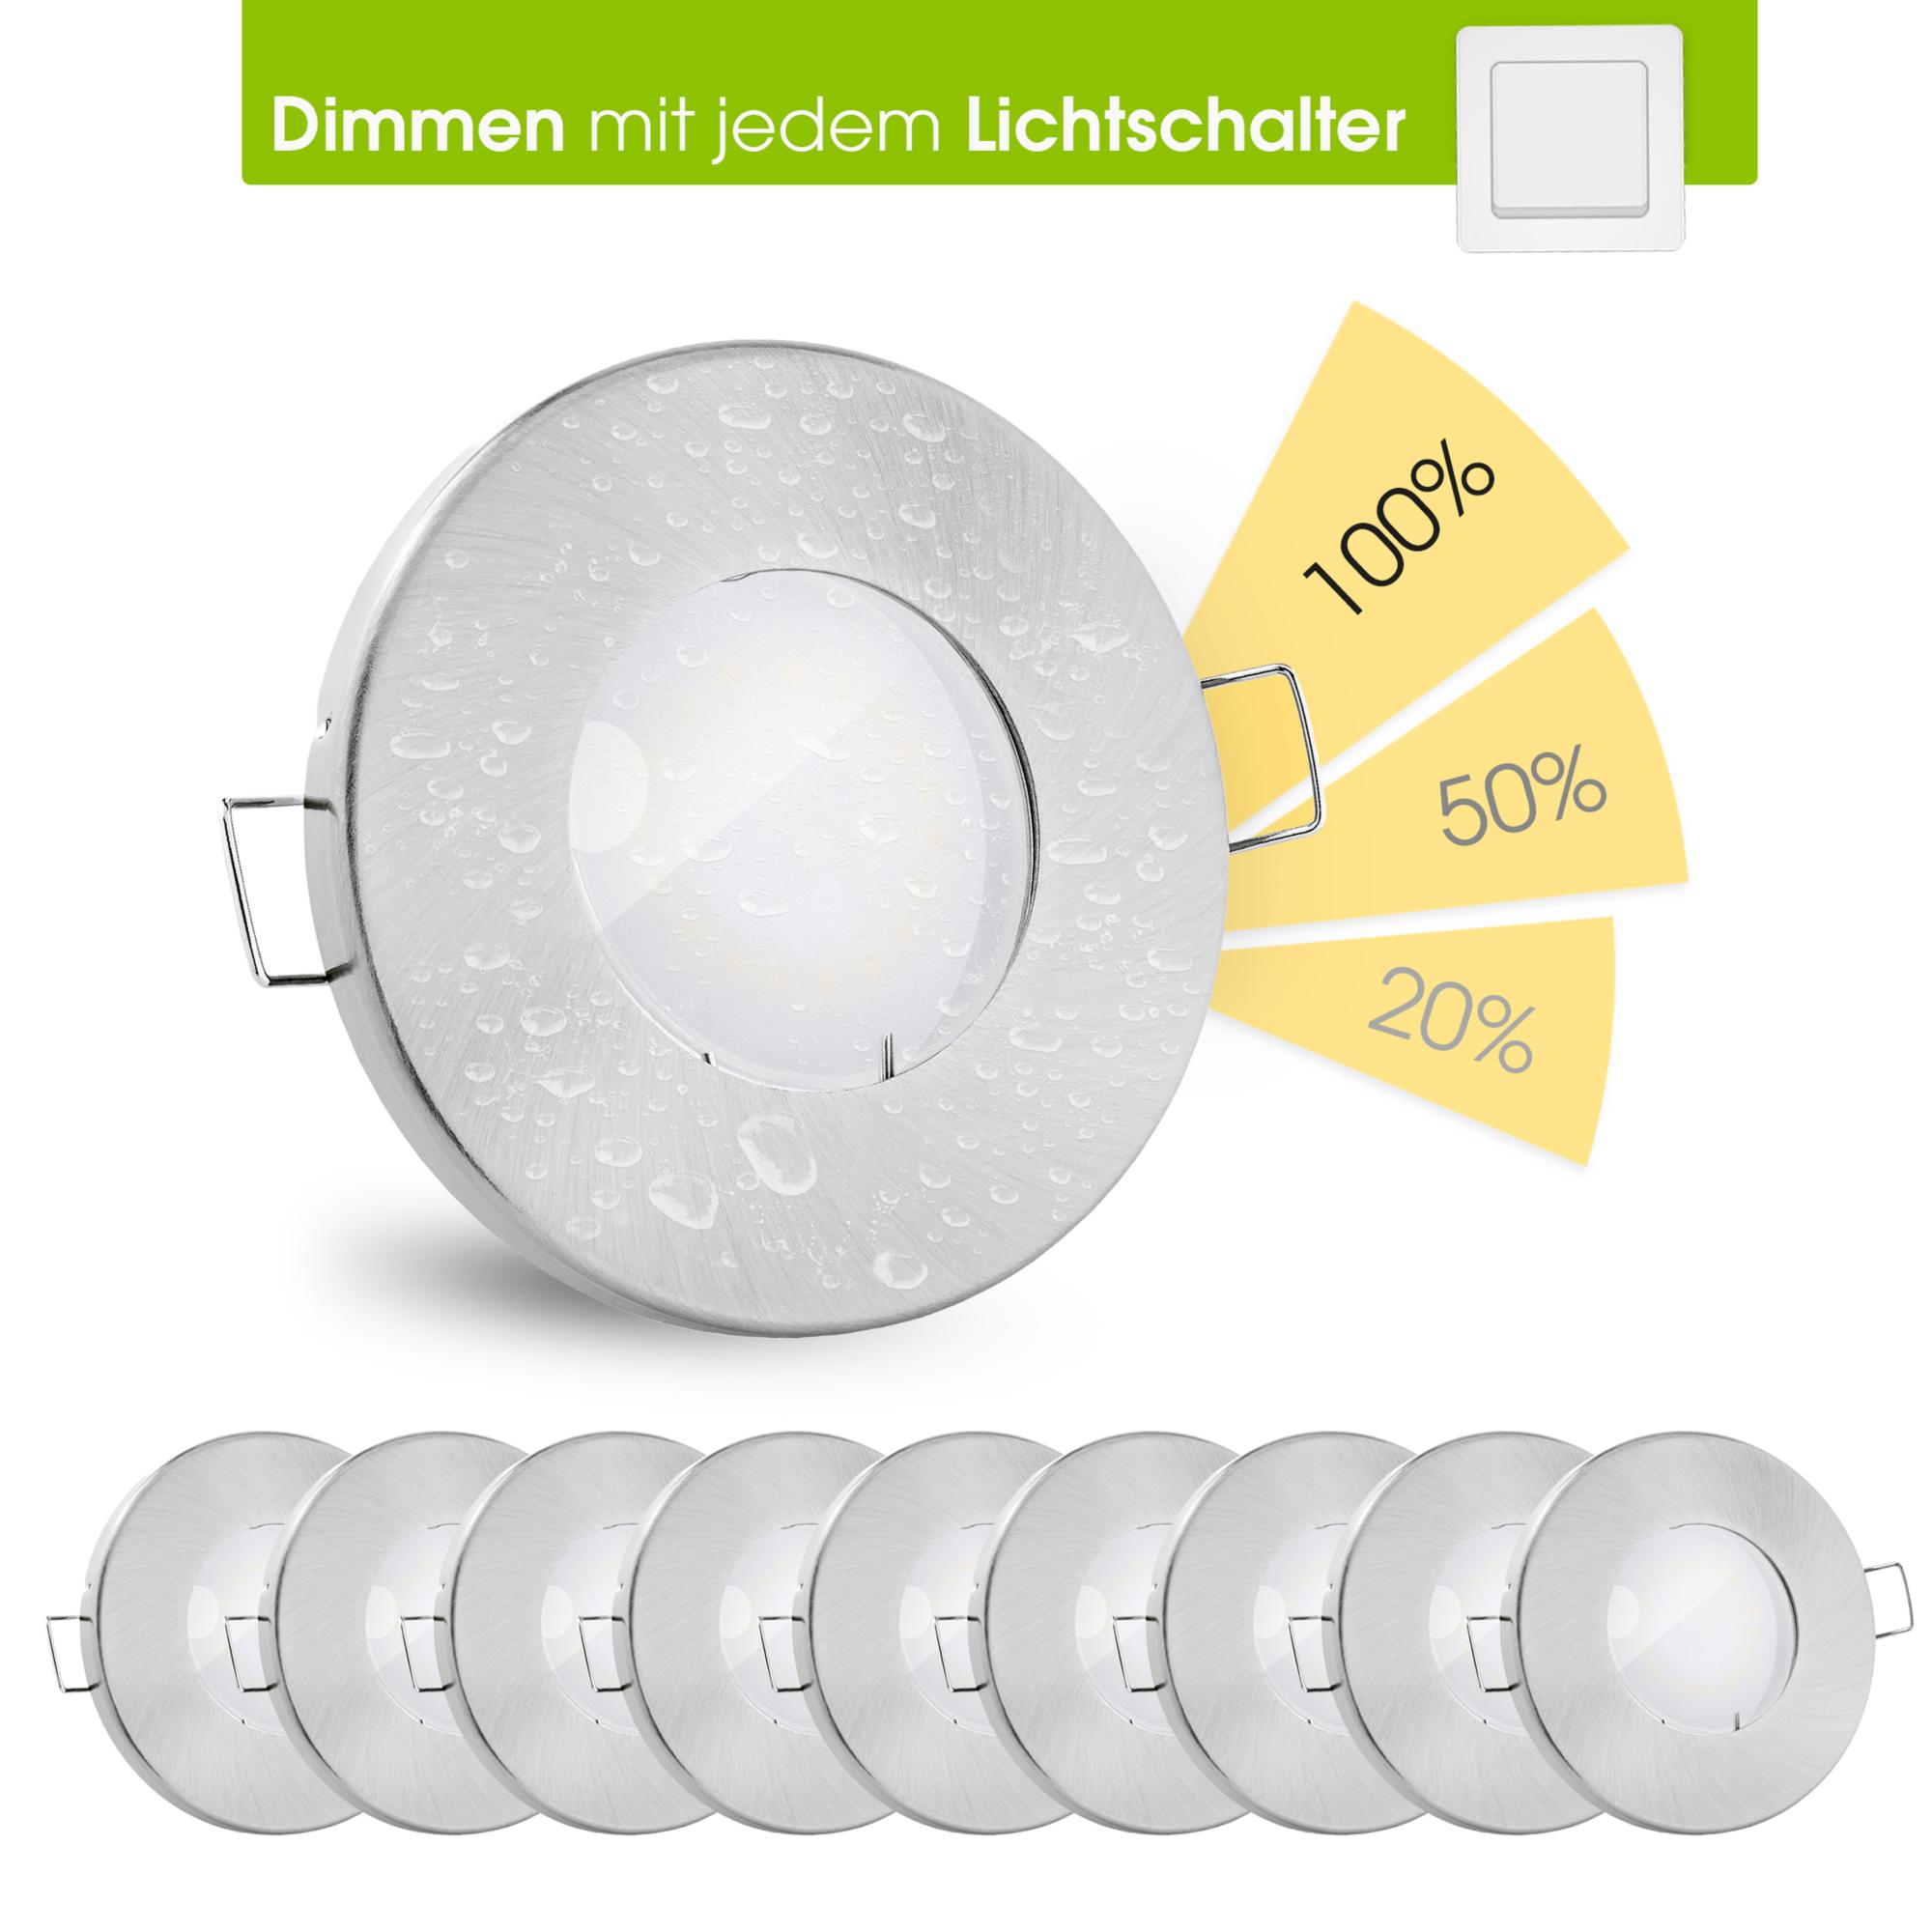 10 Stück fourSTEP LED Einbauspots Bad \